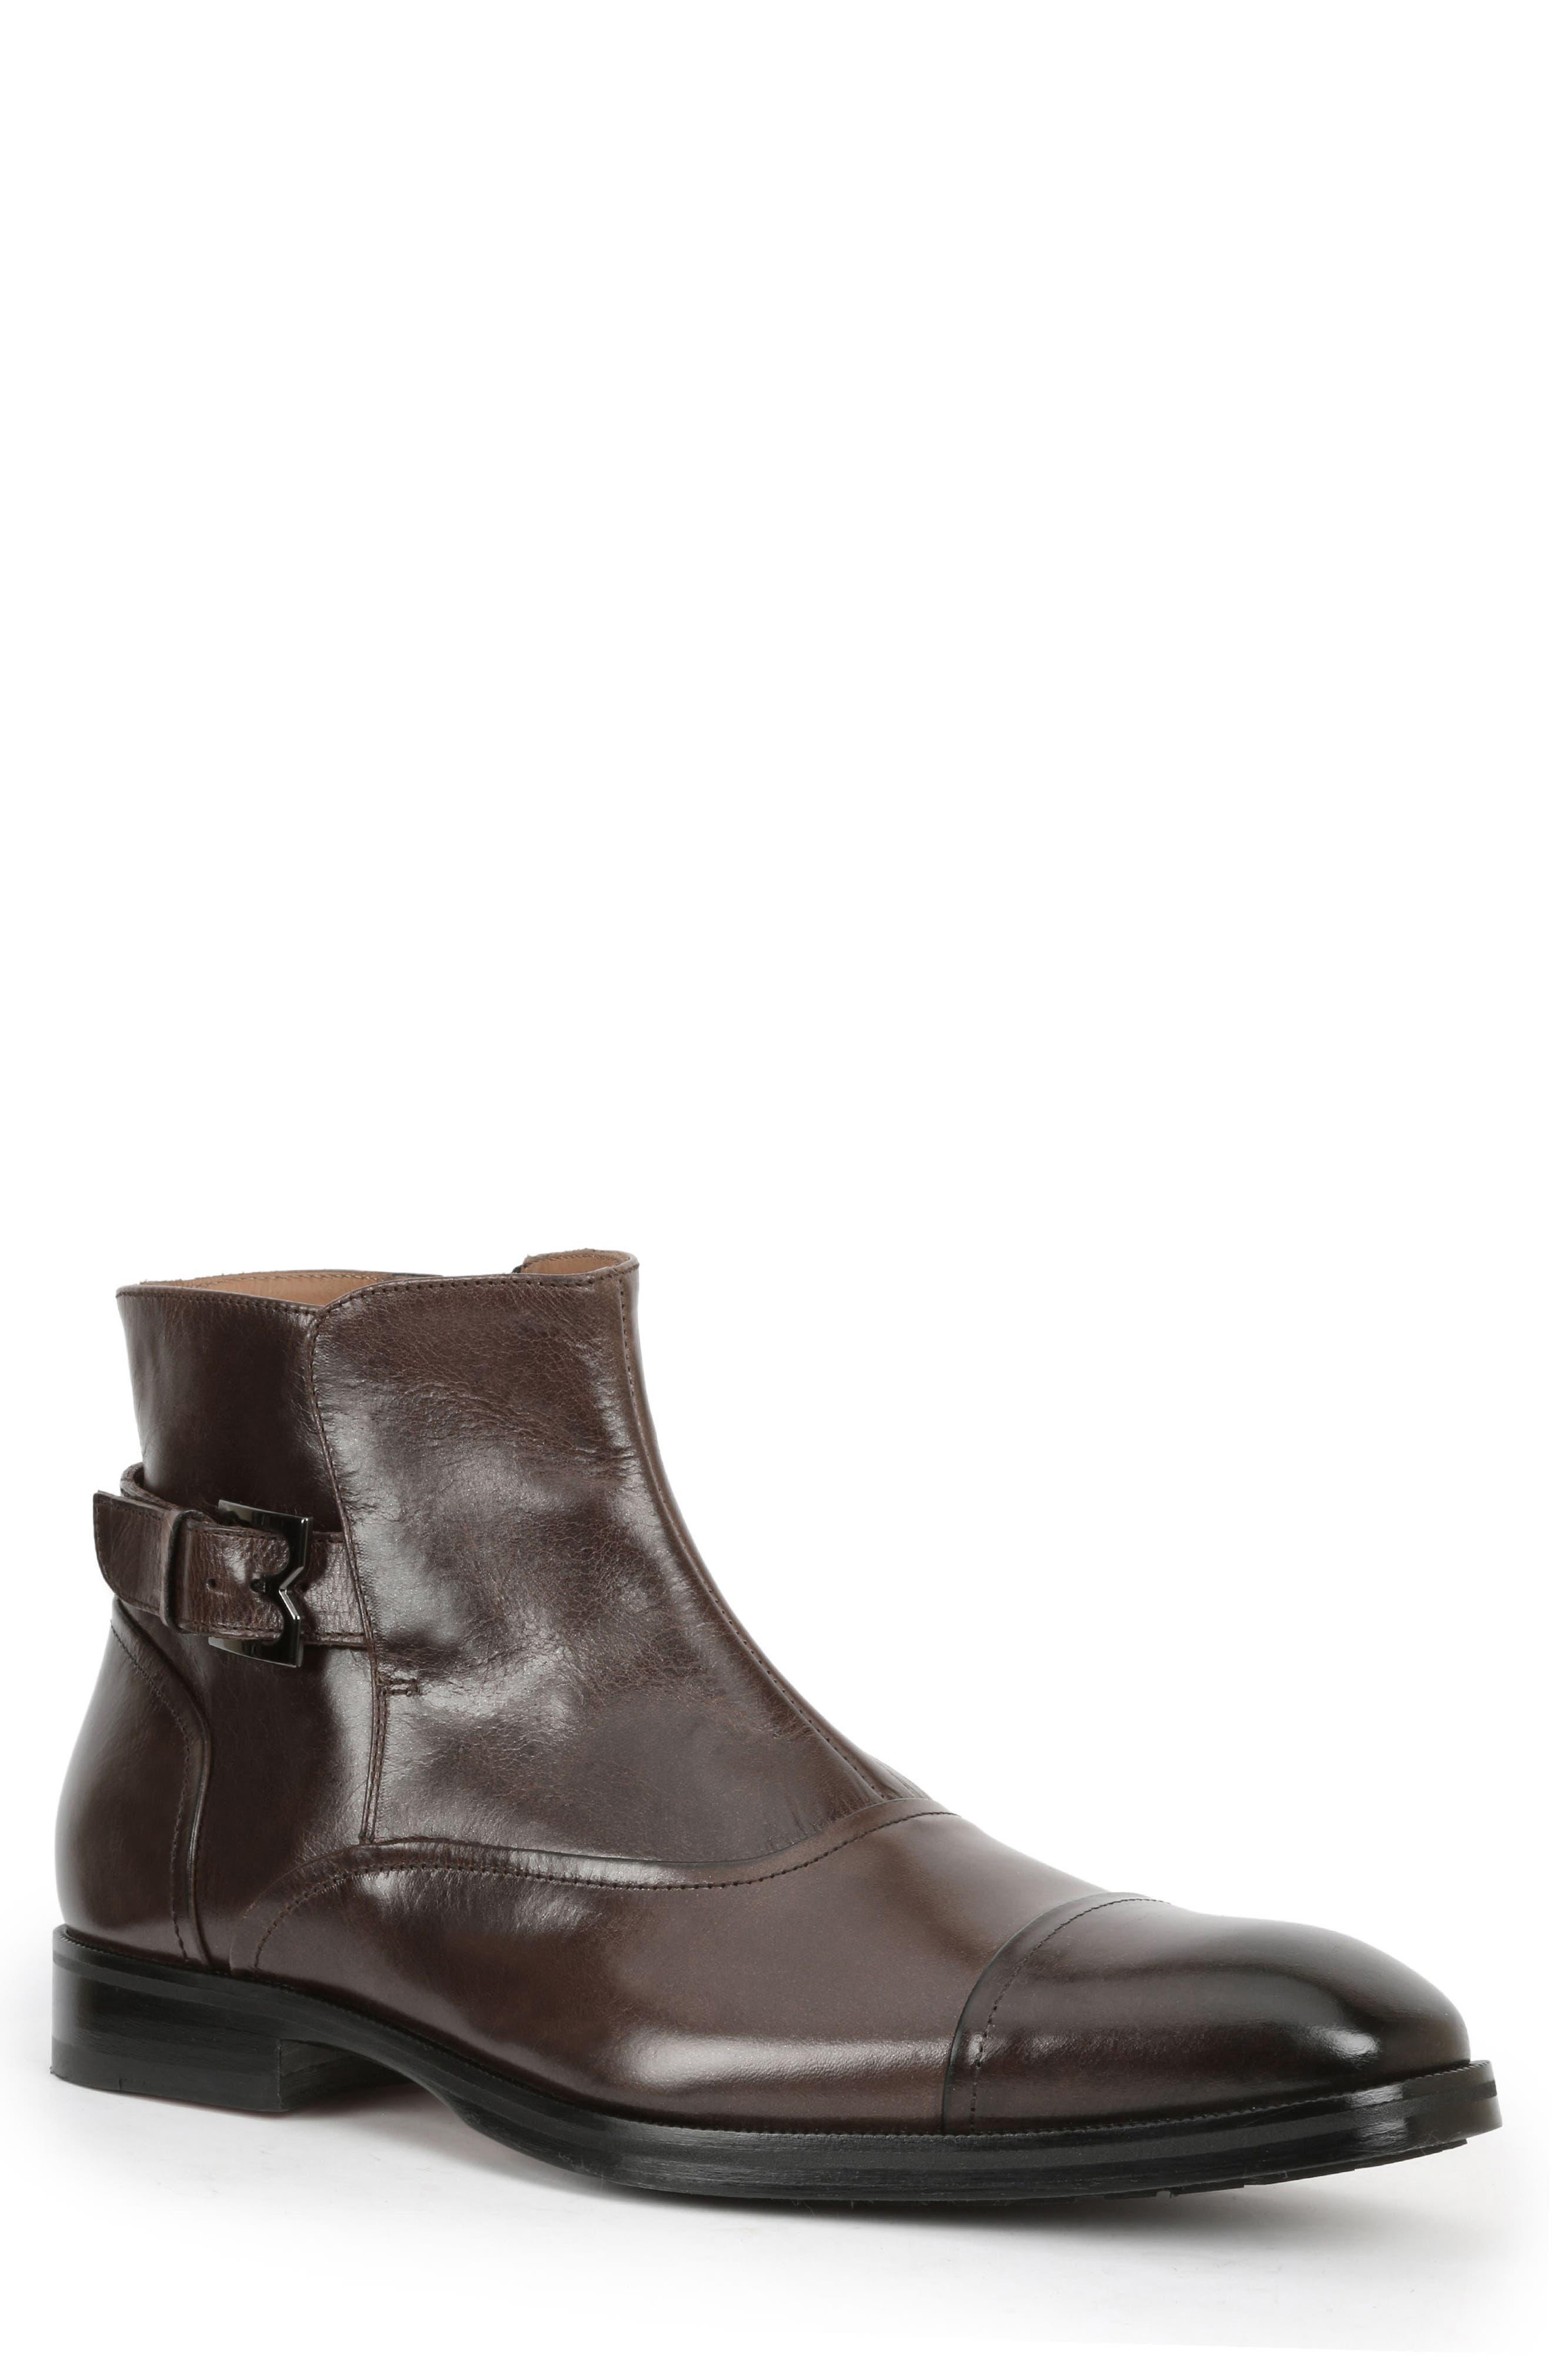 Bruno Magli Arcadia Leather Cap Toe Boots EBVl4c7O9